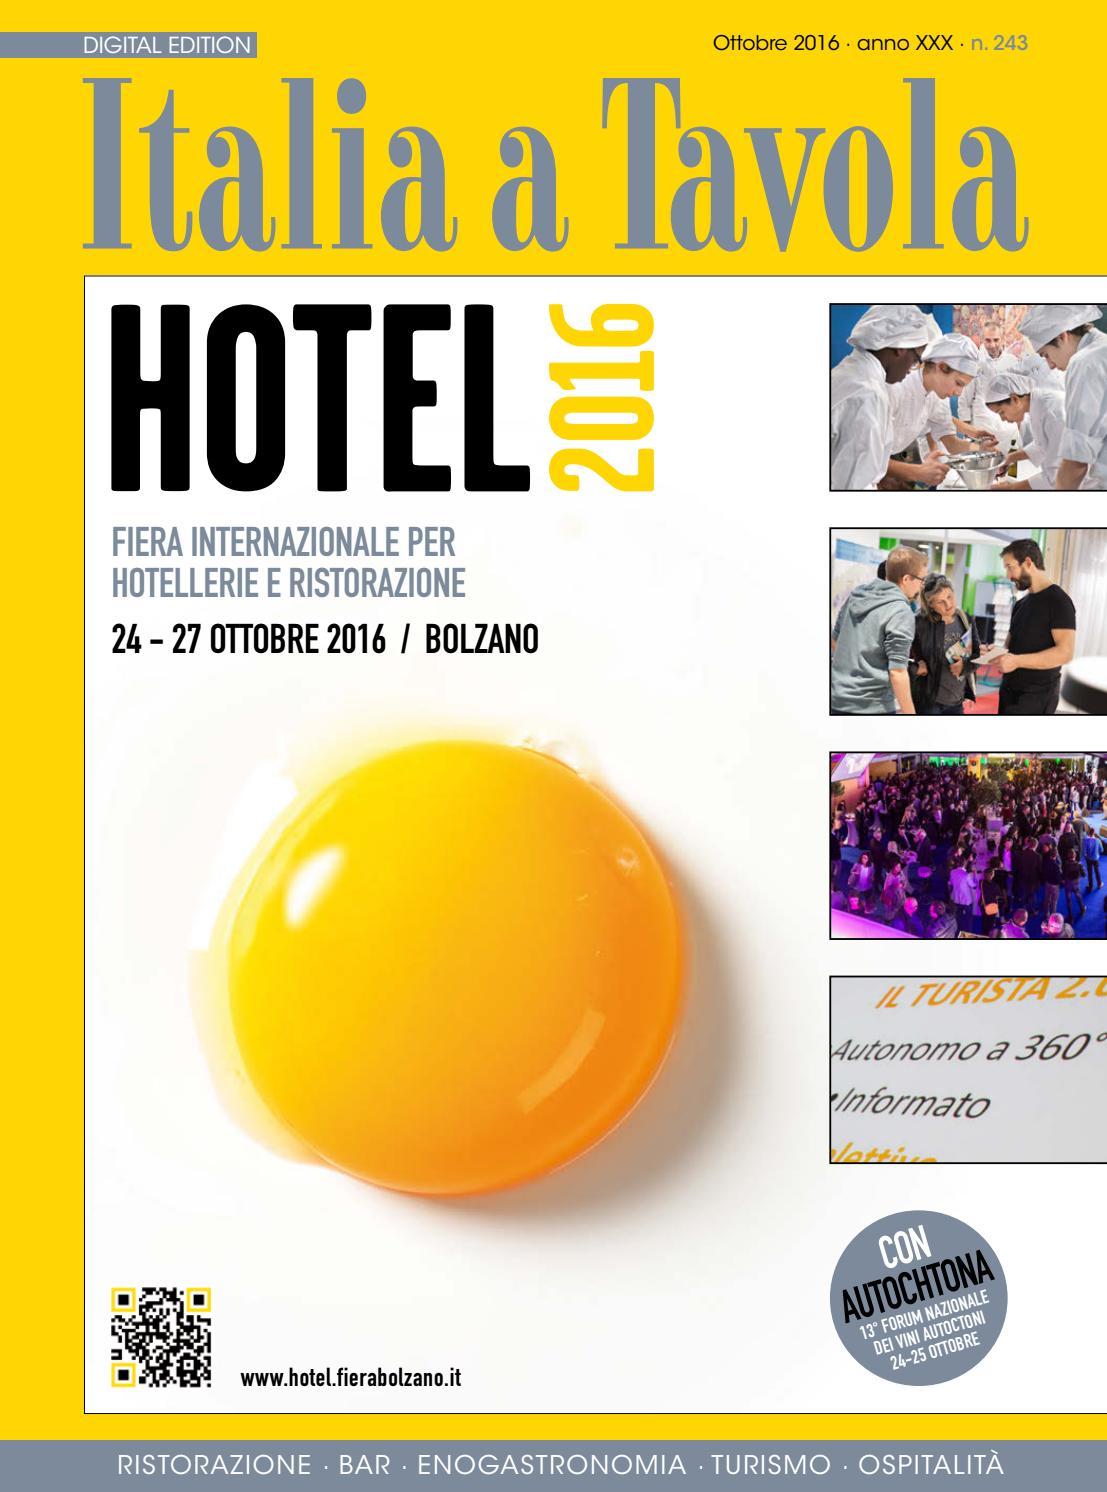 Italia a Tavola 243 Ottobre 2016 by Italia a Tavola - issuu aba671acde6